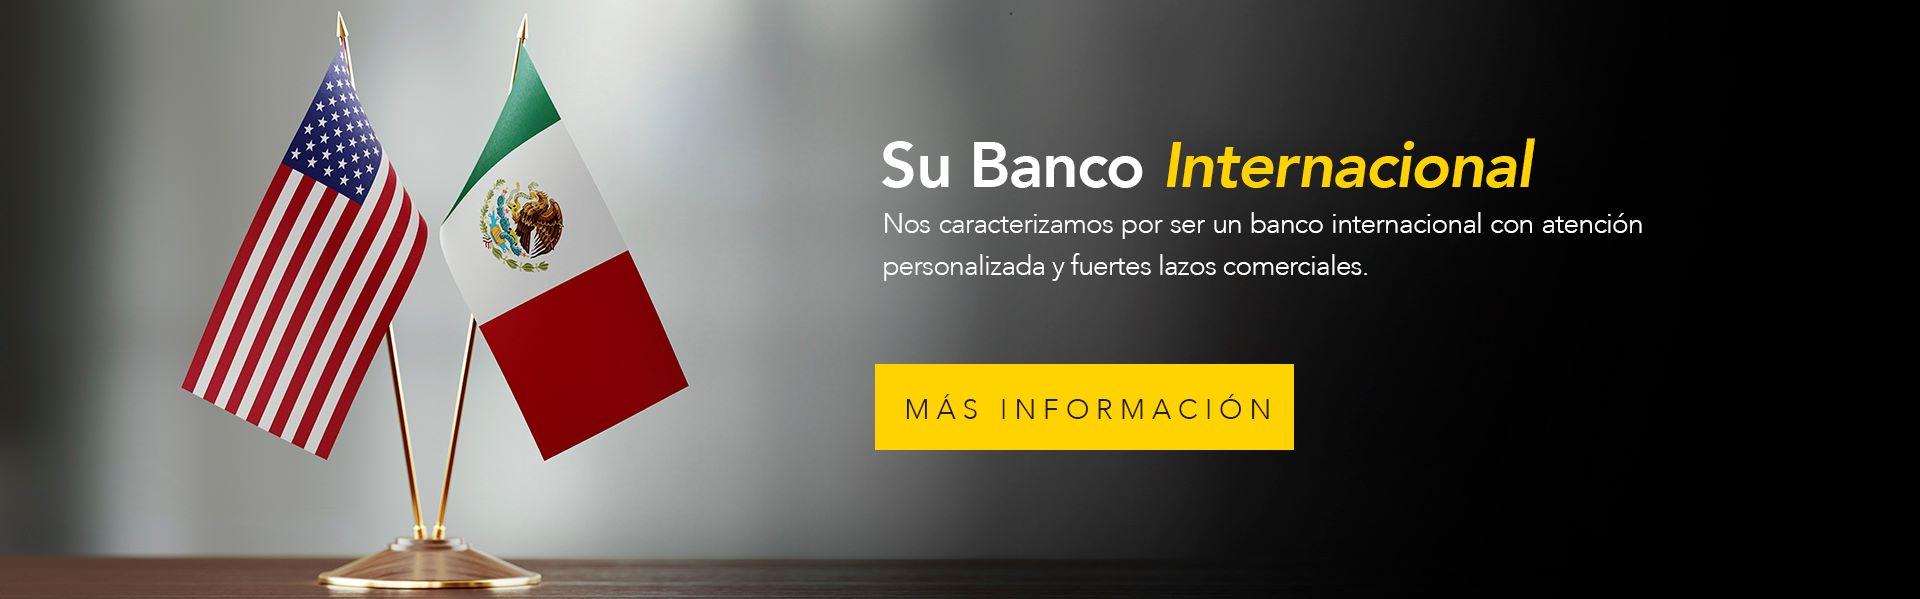 March 2021 - International Business Services ESP